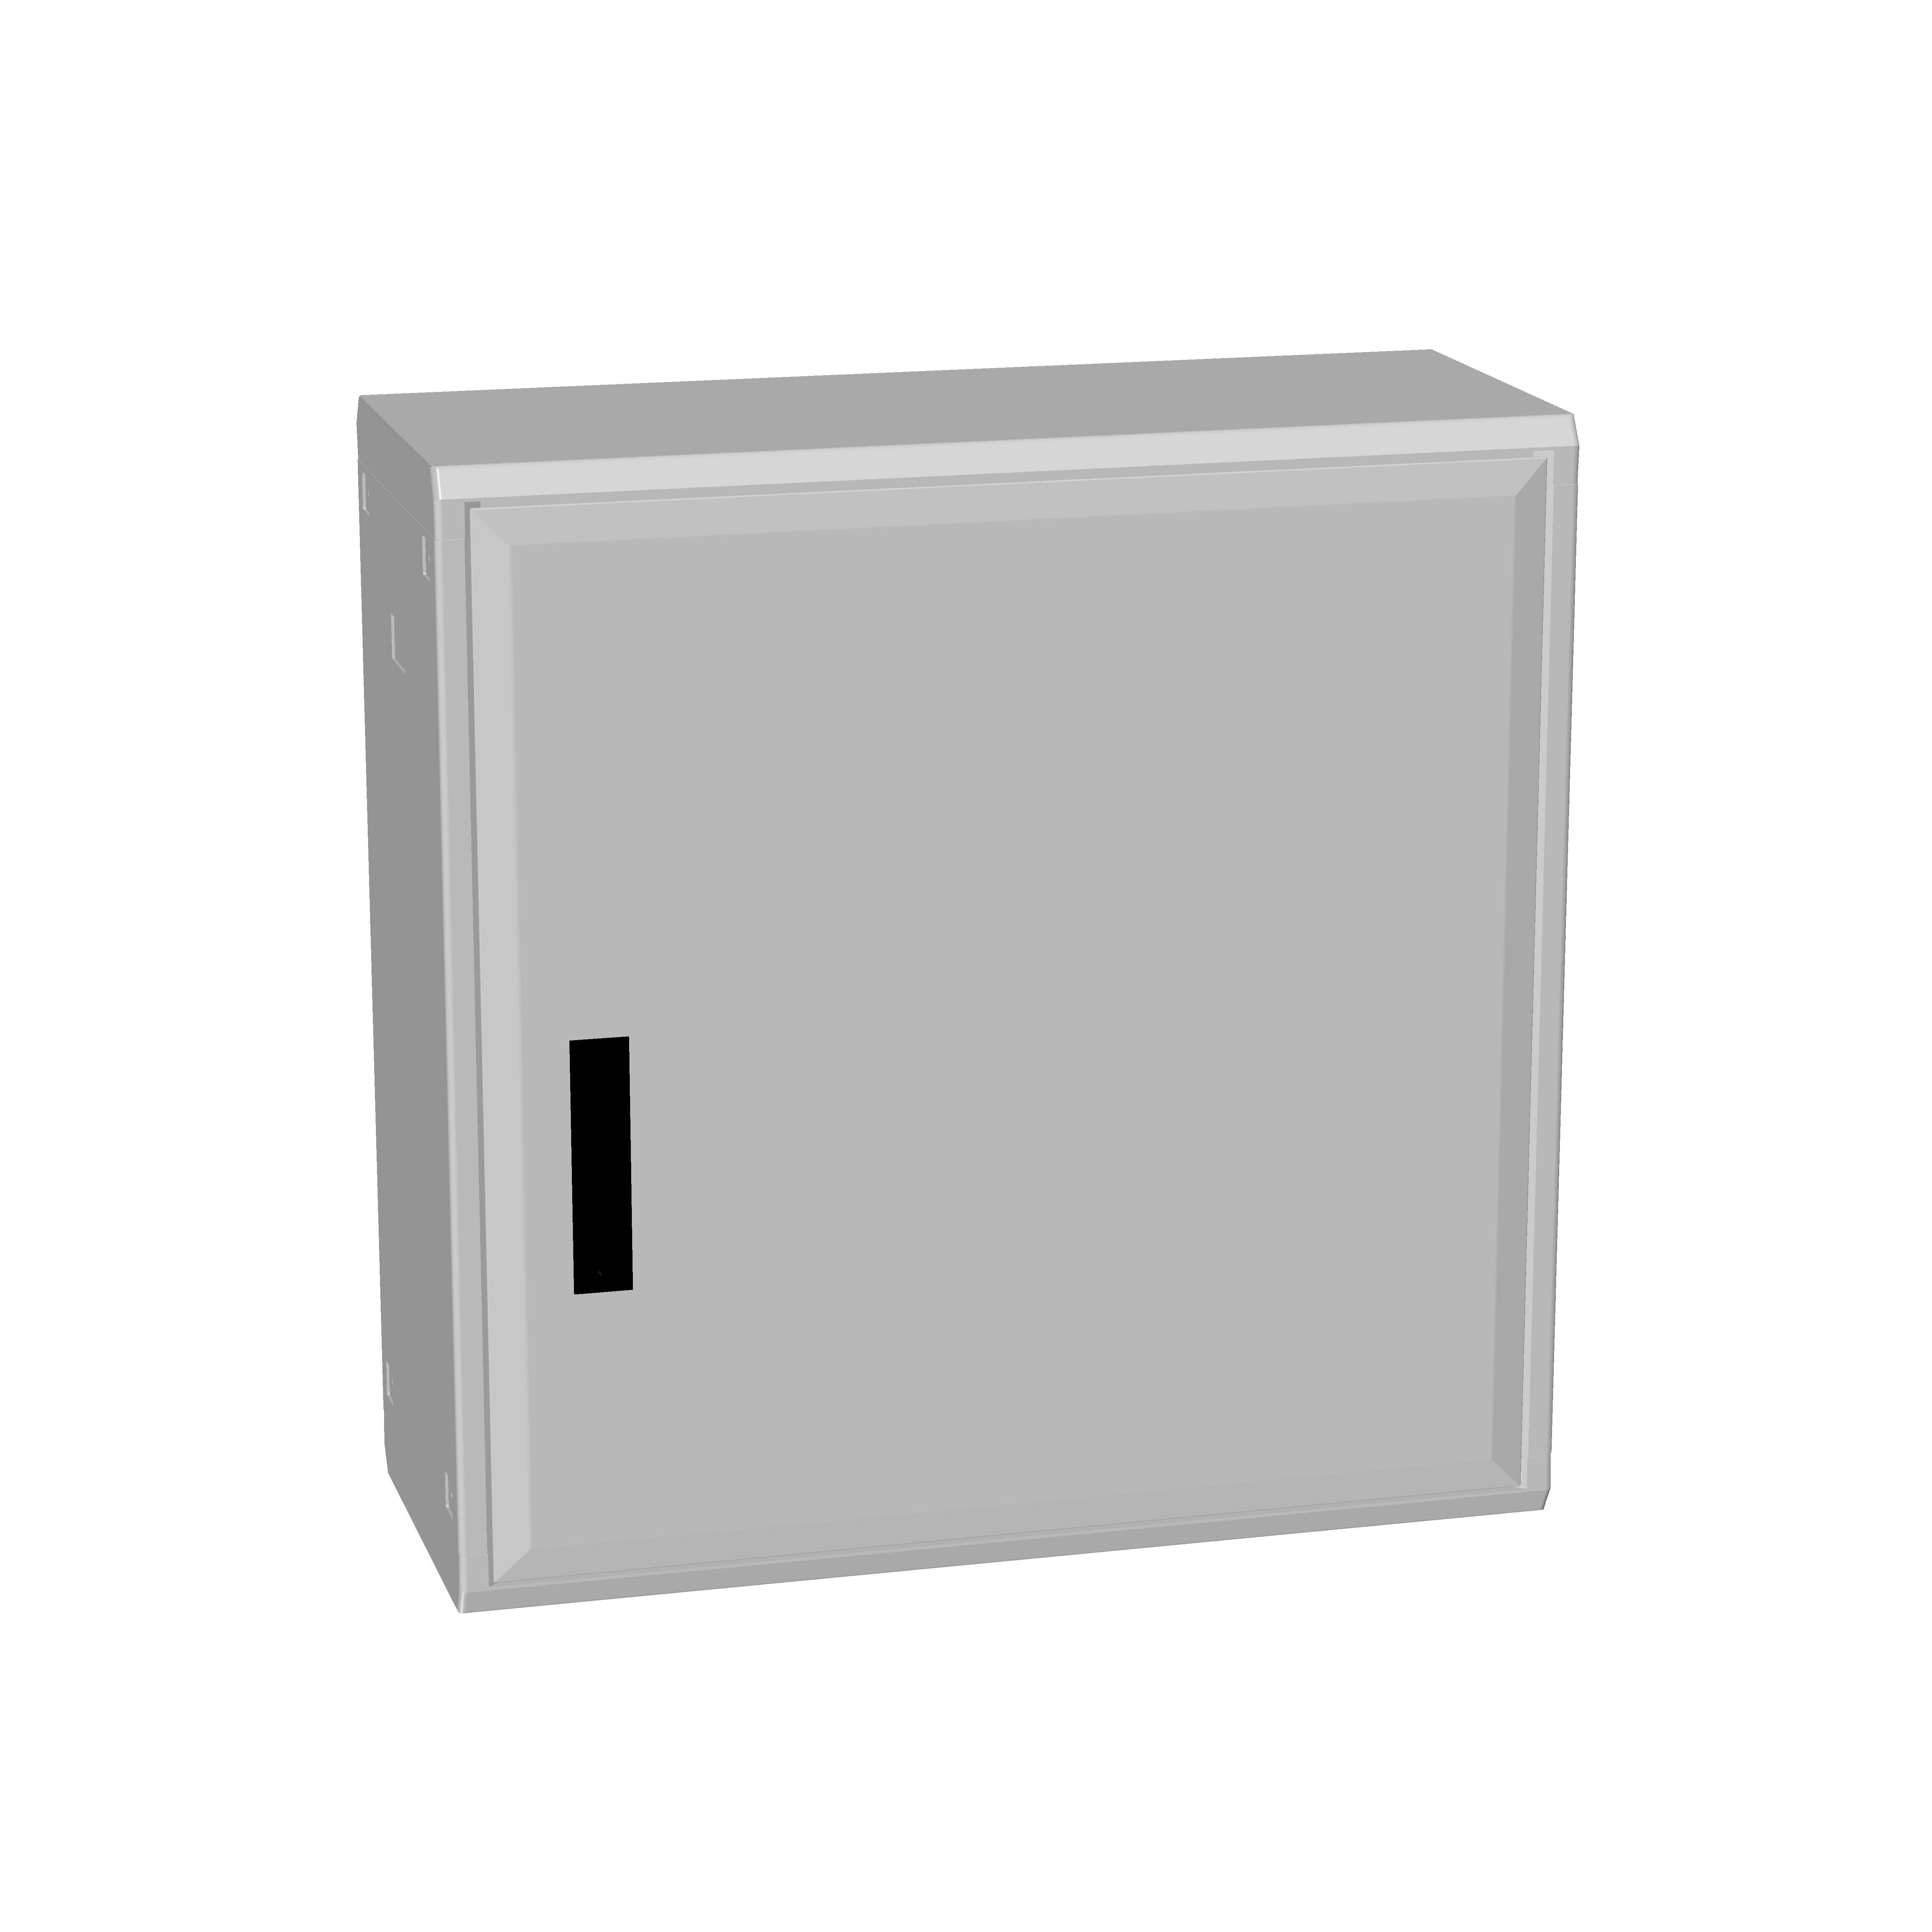 1 Stk Polyesterschrank, eintürig, 750x750x312 POCC3330--